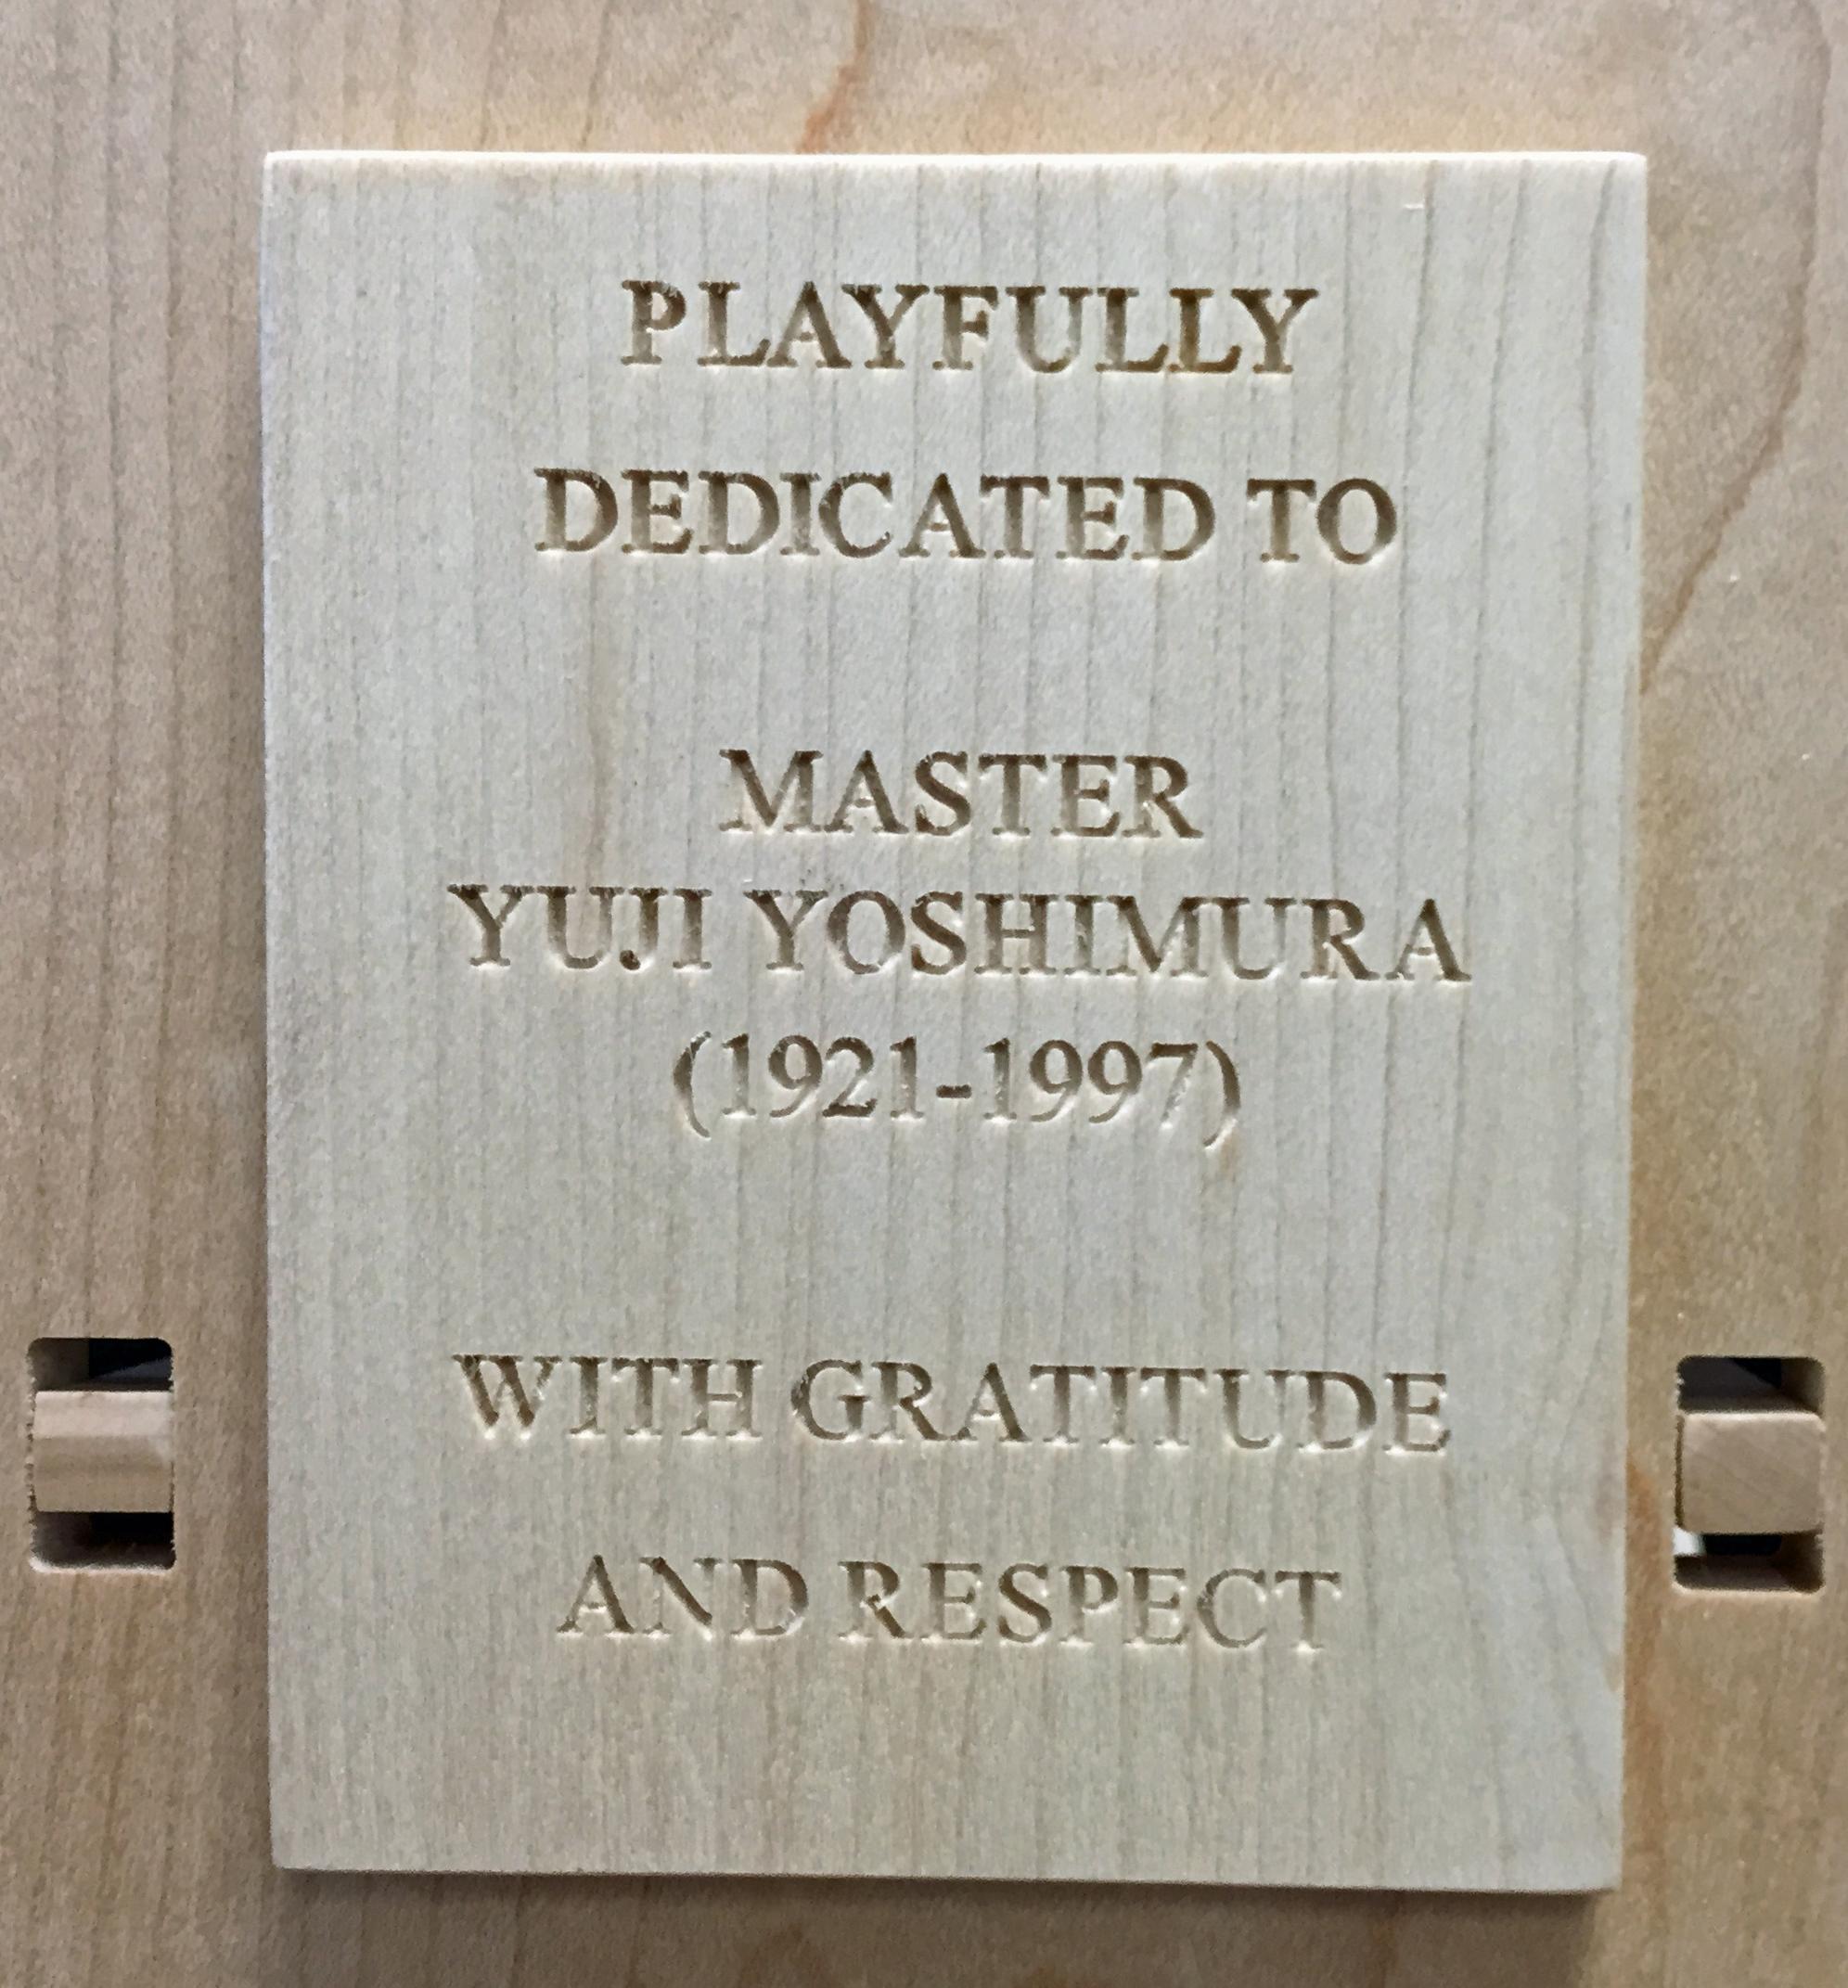 The dedication to my first bonsai teacher.